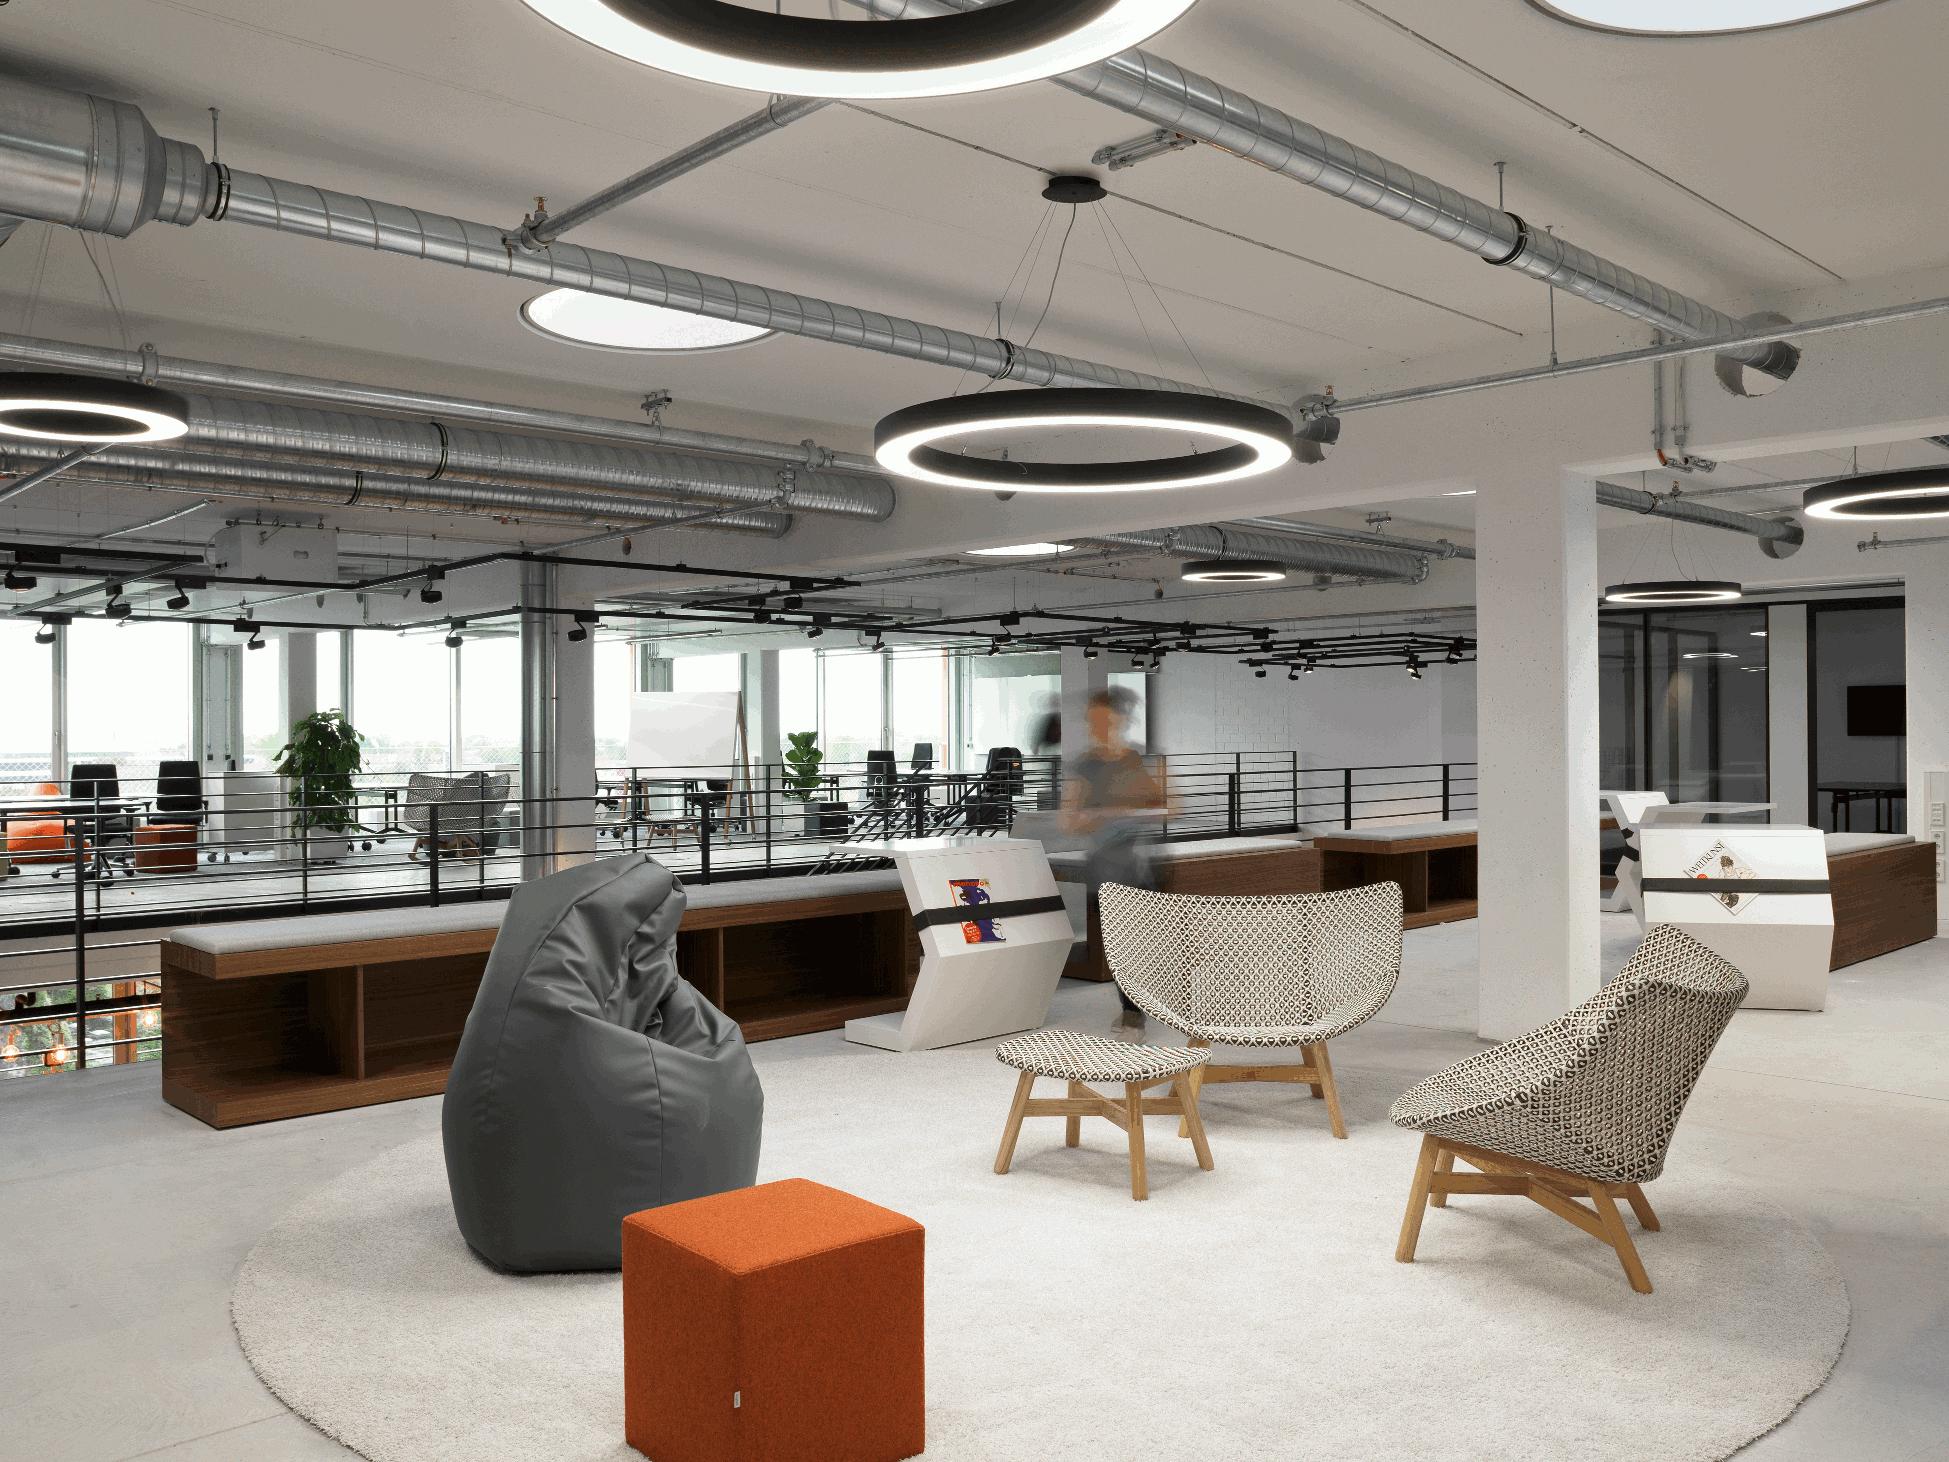 arbeiten im gro raumb ro das open space b ro als produktiver arbeitsplatz business. Black Bedroom Furniture Sets. Home Design Ideas